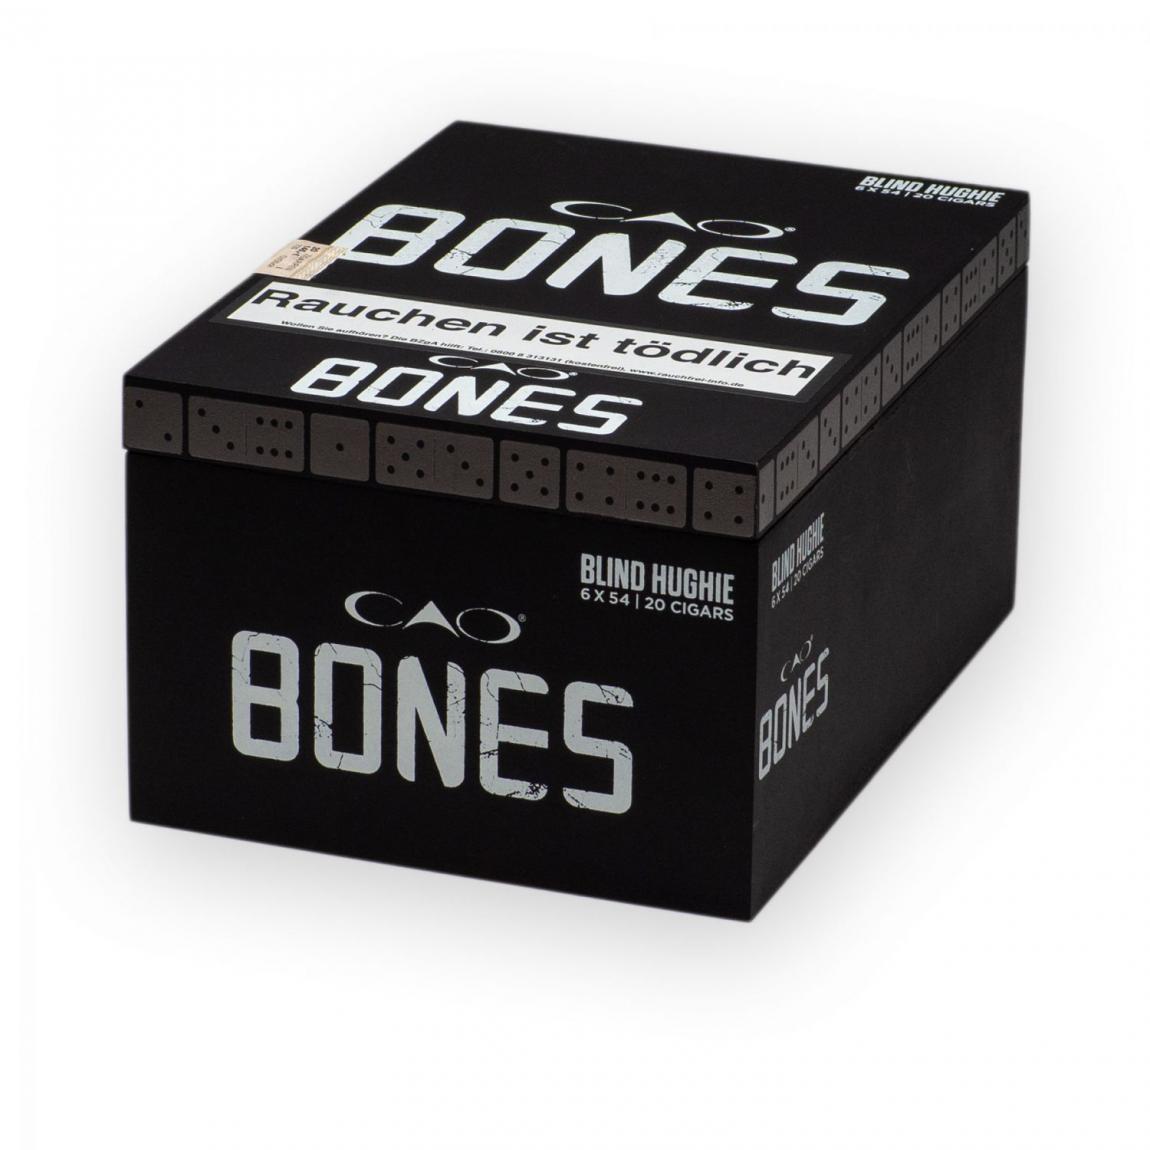 CAO Bones »Chicken Blind Hughie« Toro, 20er Kiste